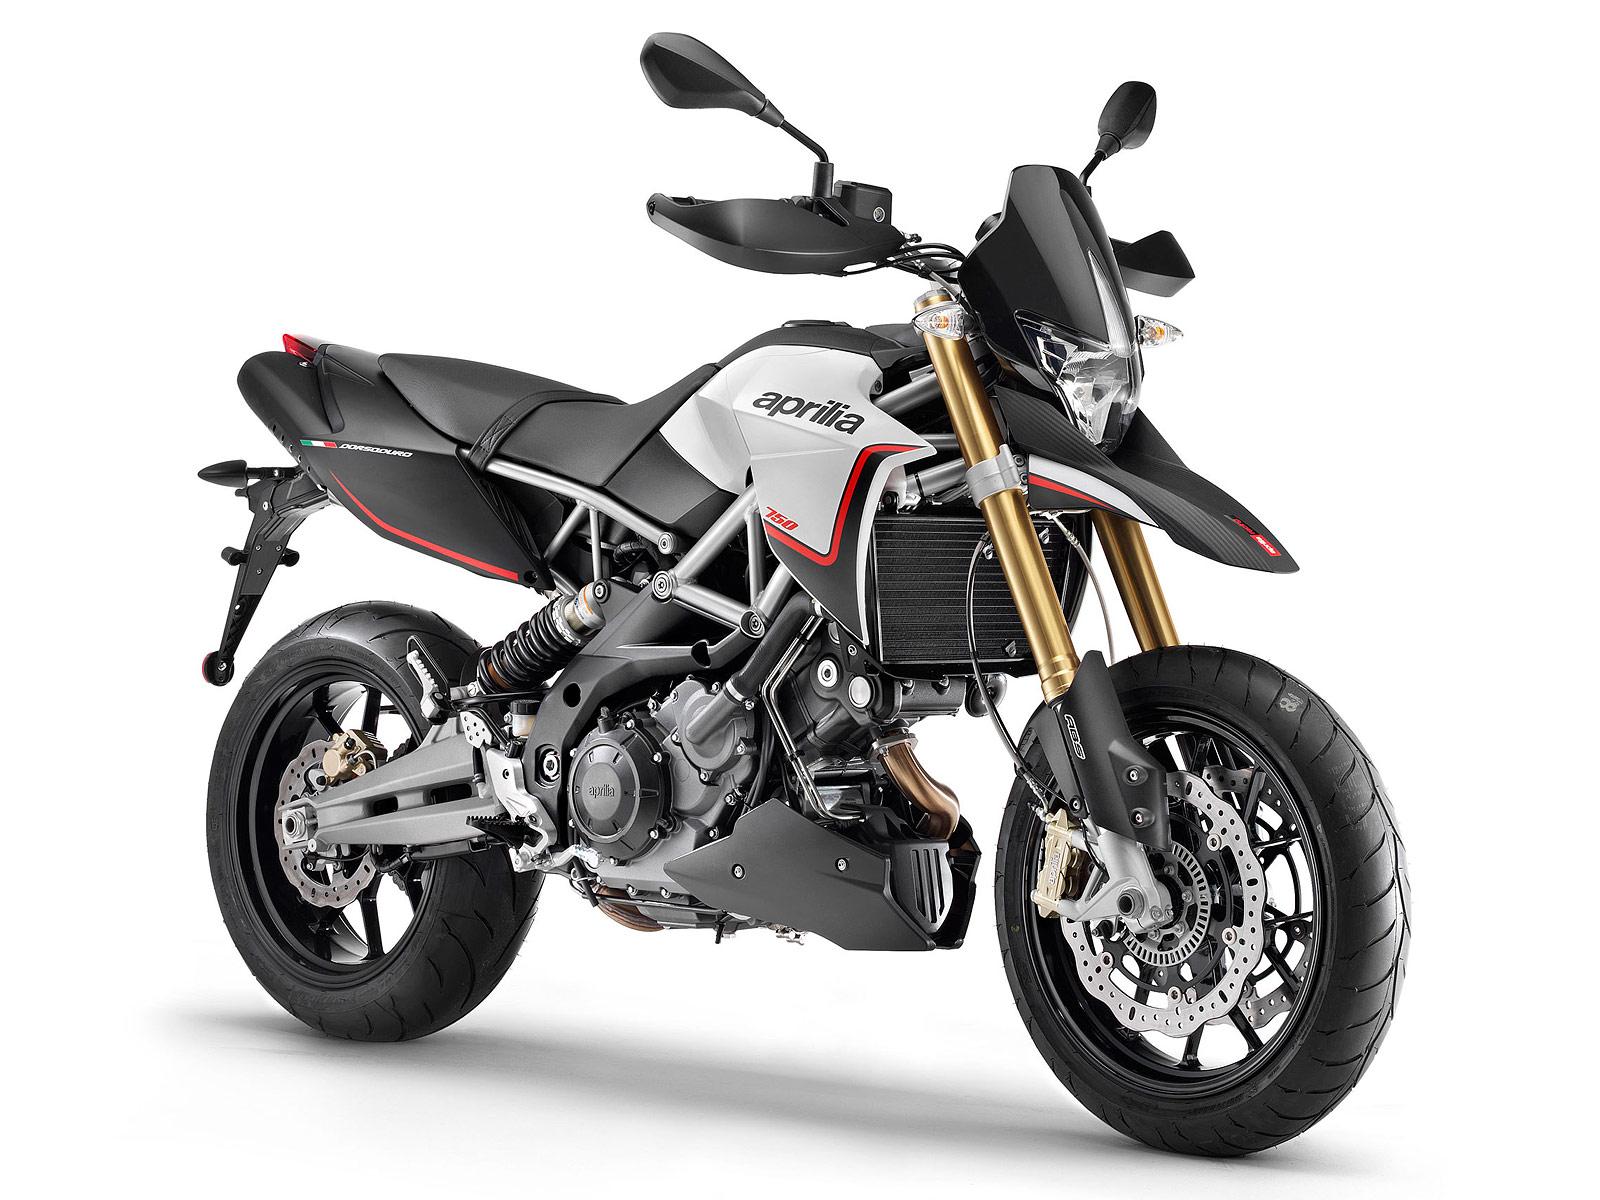 2013 aprilia dorsoduro 750 abs motorcycle insurance information. Black Bedroom Furniture Sets. Home Design Ideas